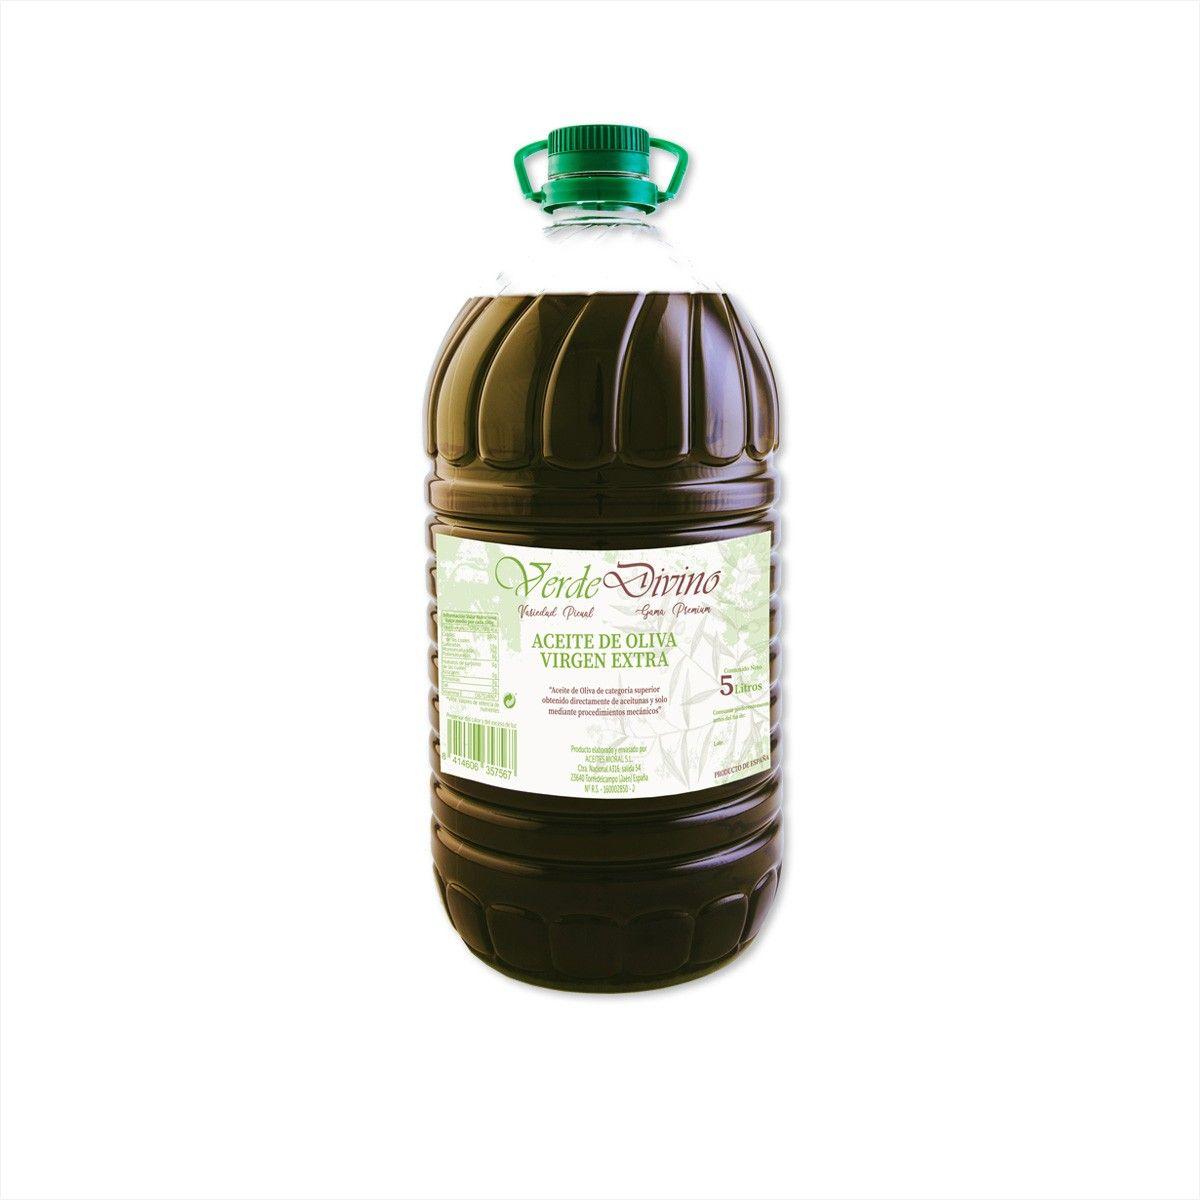 Garrafa de Aceite de Oliva Virgen Extra 5Litros